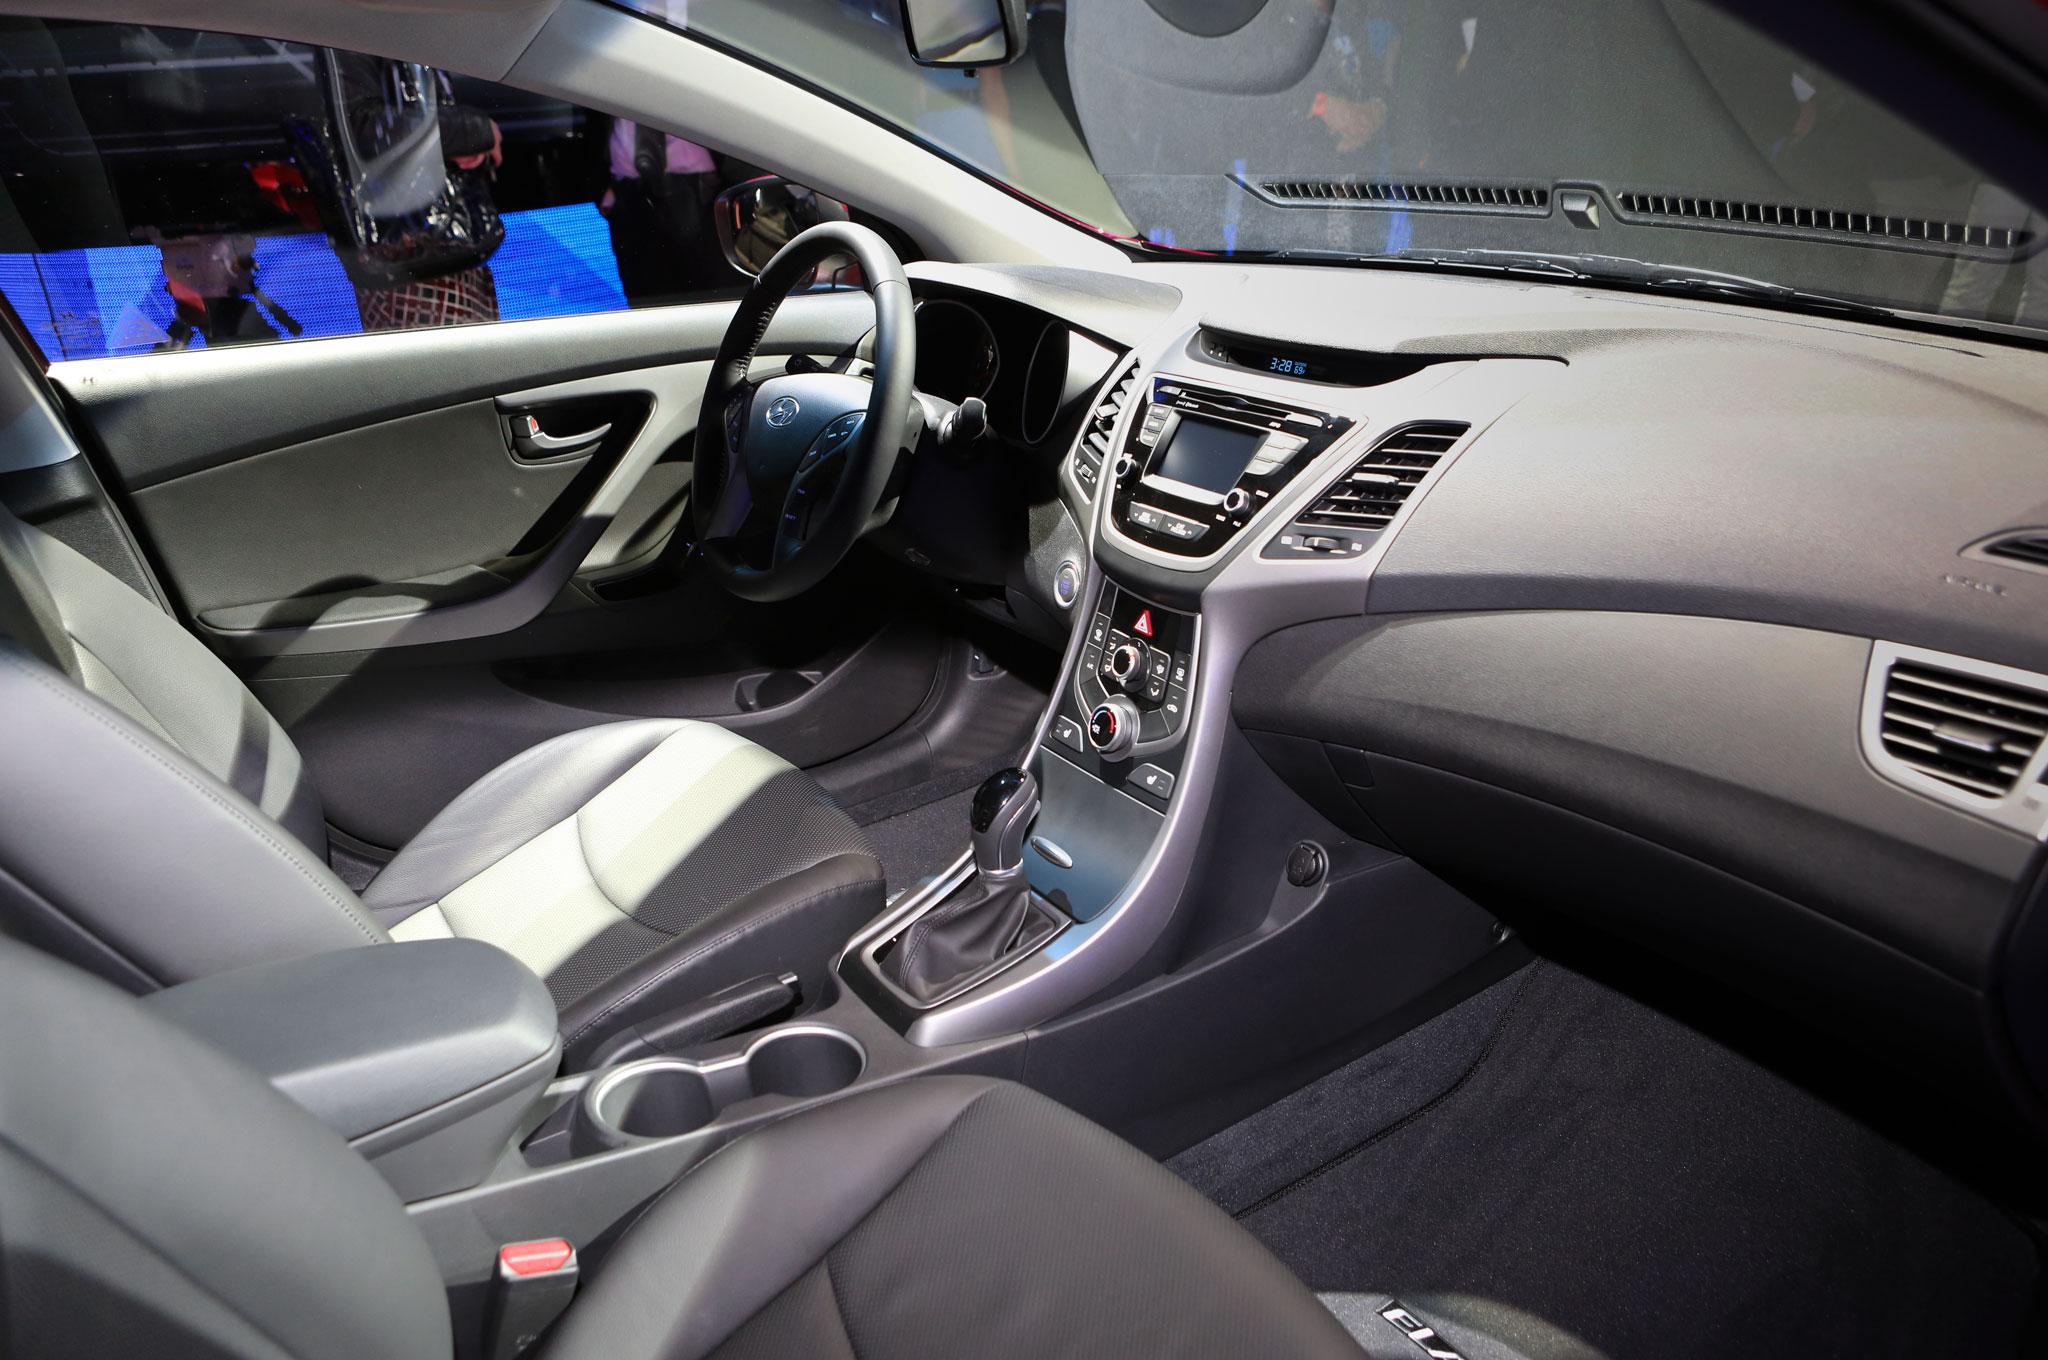 2014 Hyundai Elantra Image 14